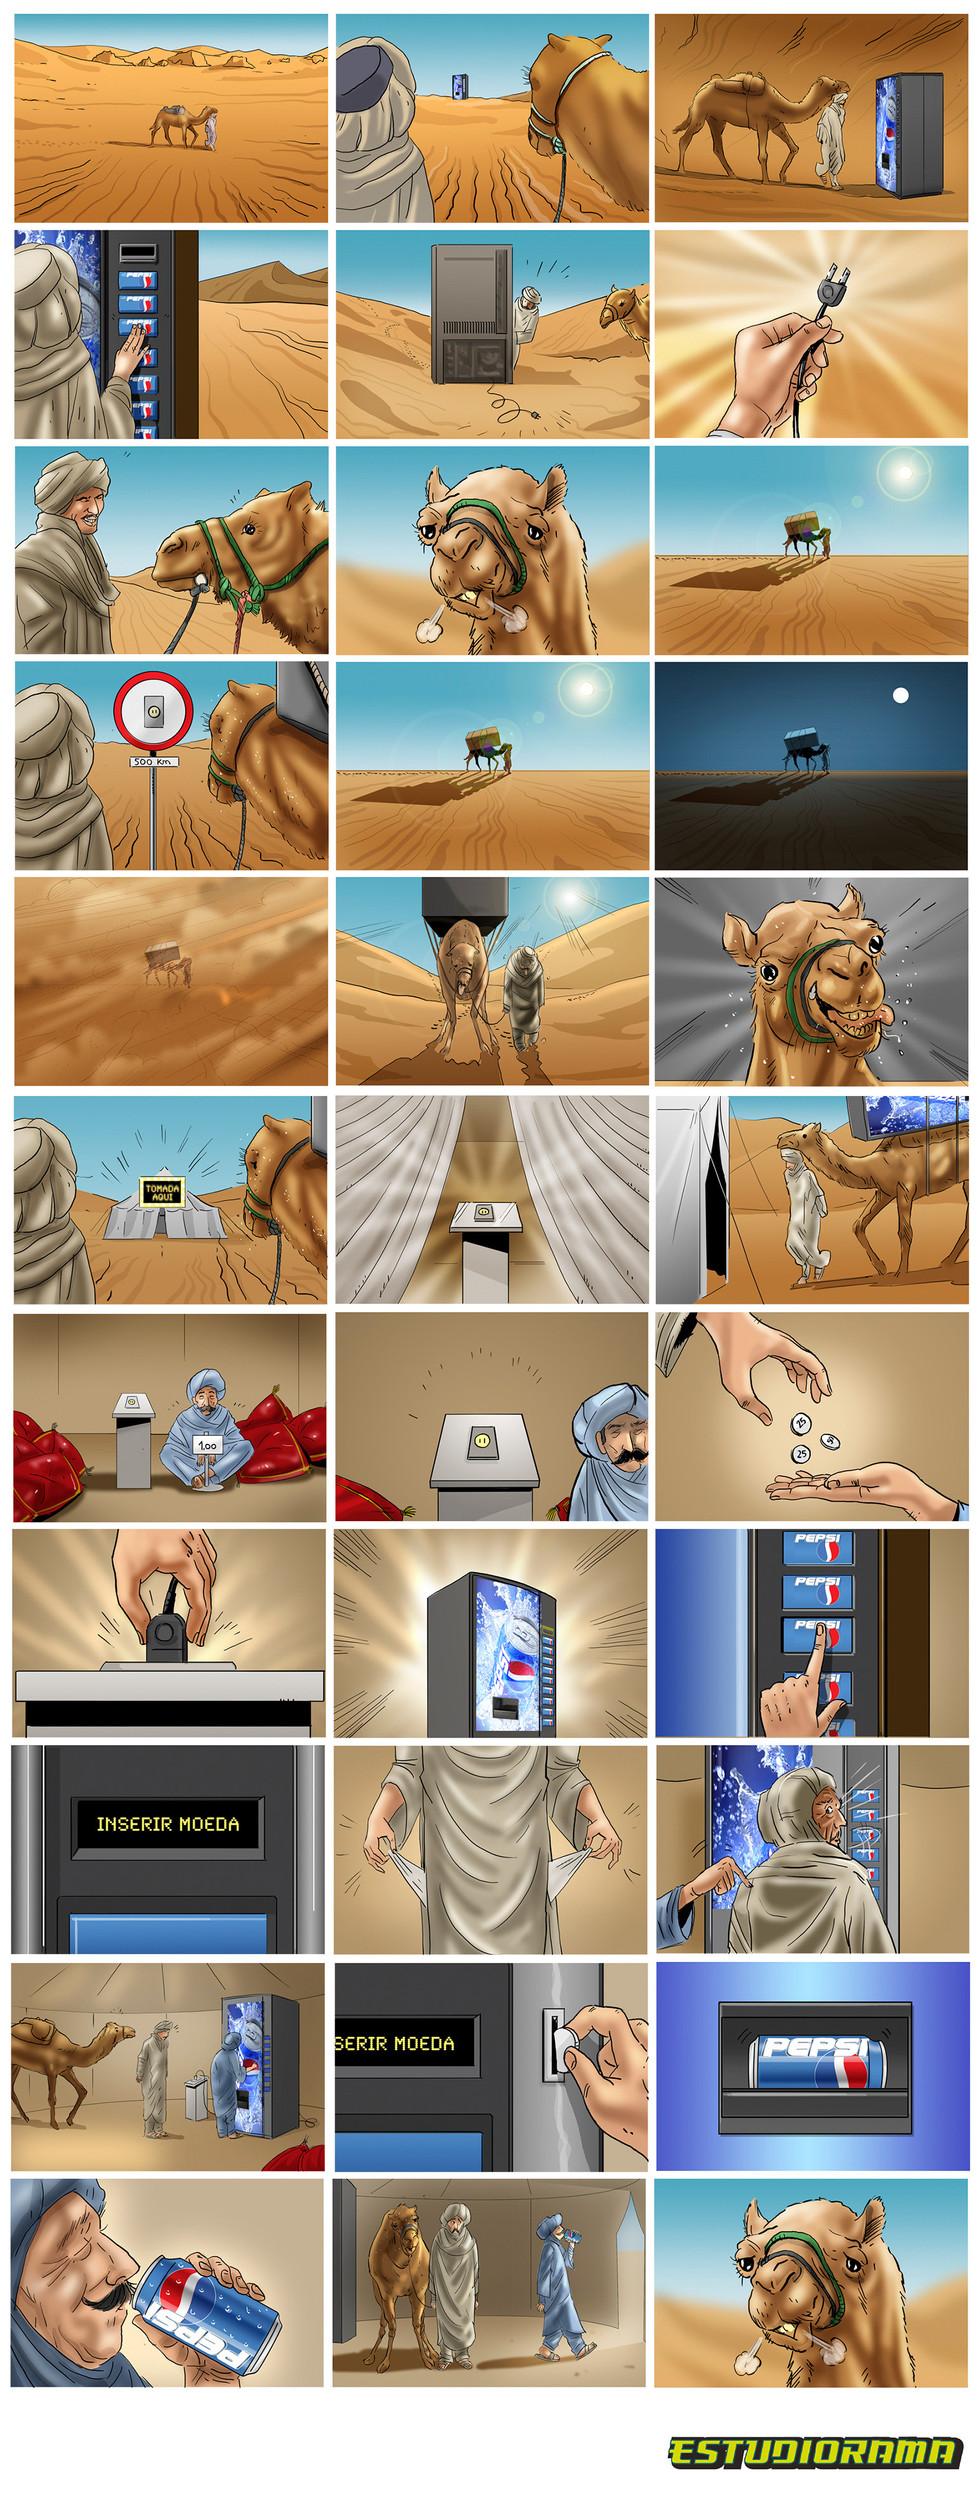 Story-Pepsi-Camelo-ALMAP-SITE.jpg